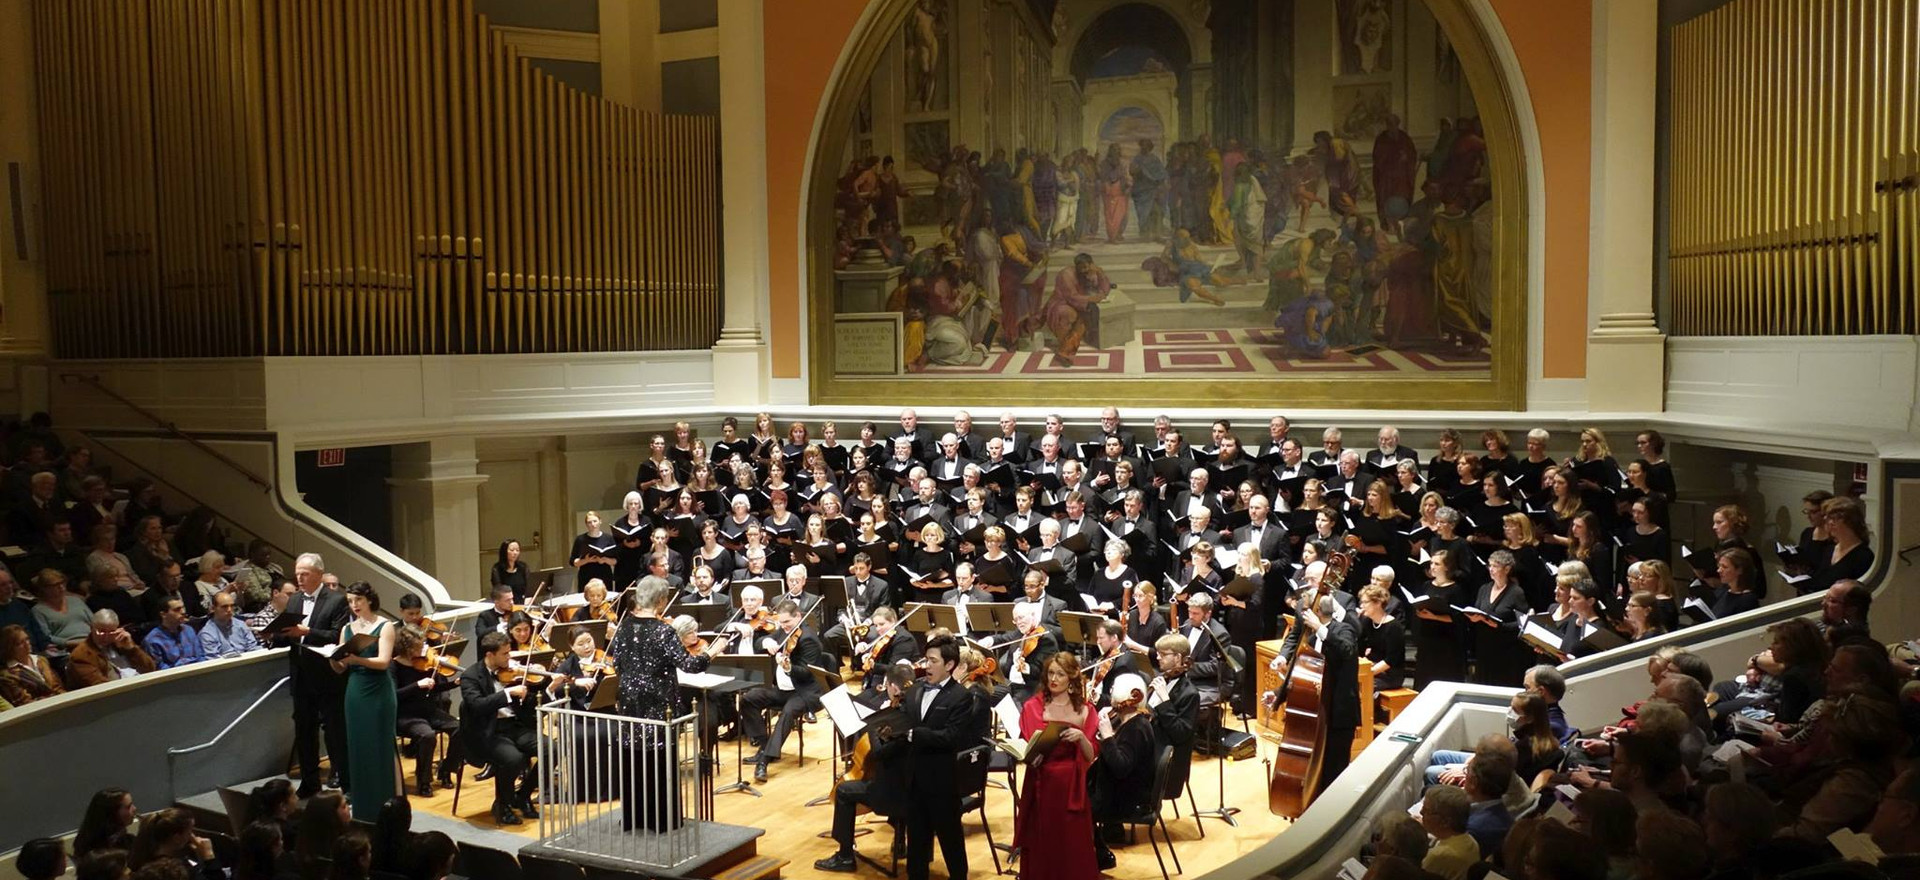 Soprano Soloist, Mozart's Requiem - The Virginia Consort